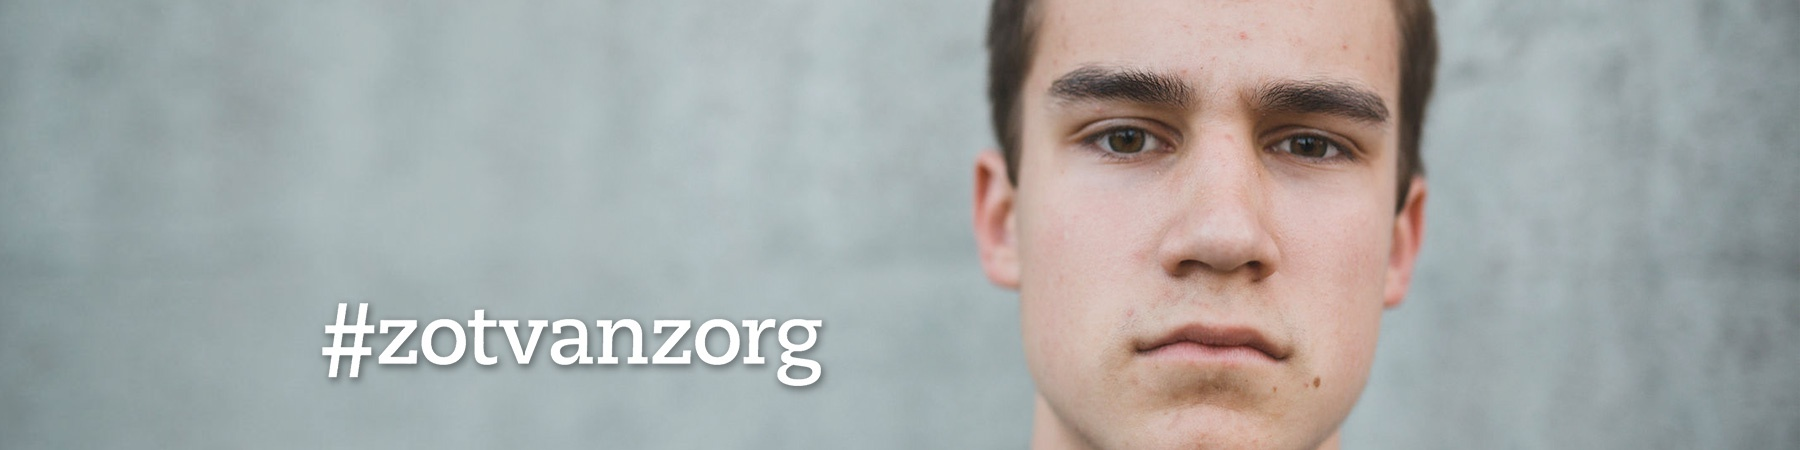 zotvanzorg_website_3_2.jpg